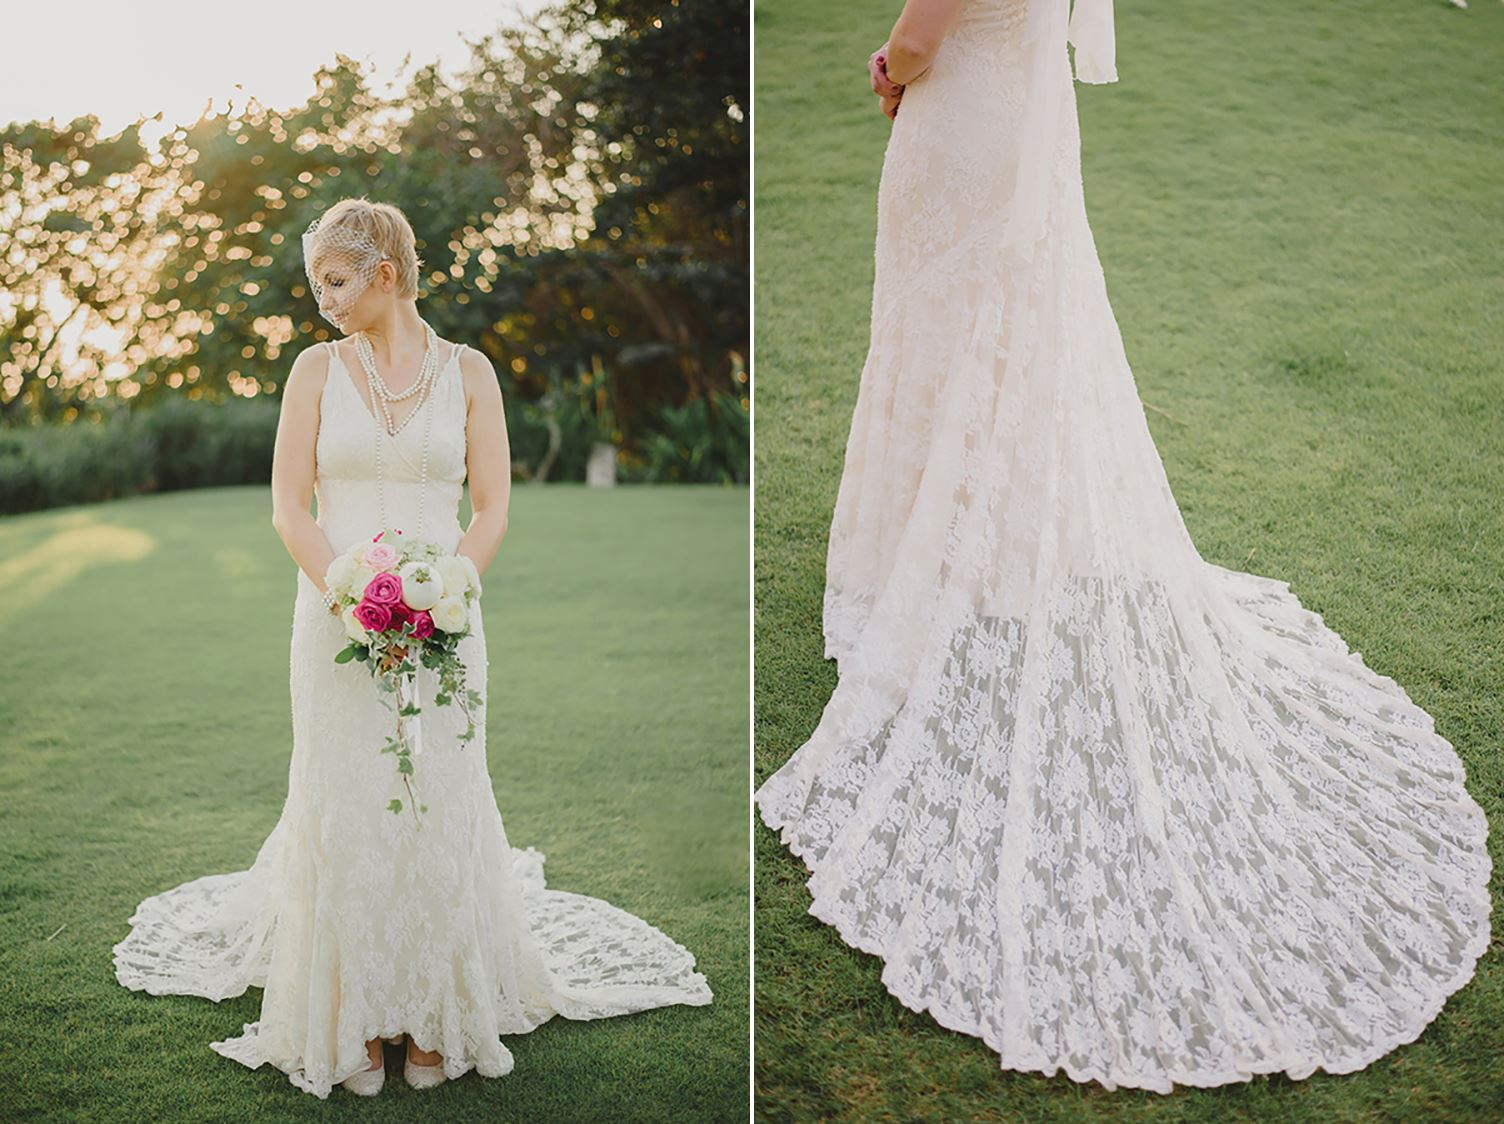 Transporting Wedding Dress For Destination Wedding : Lace wedding dress for a destination chic